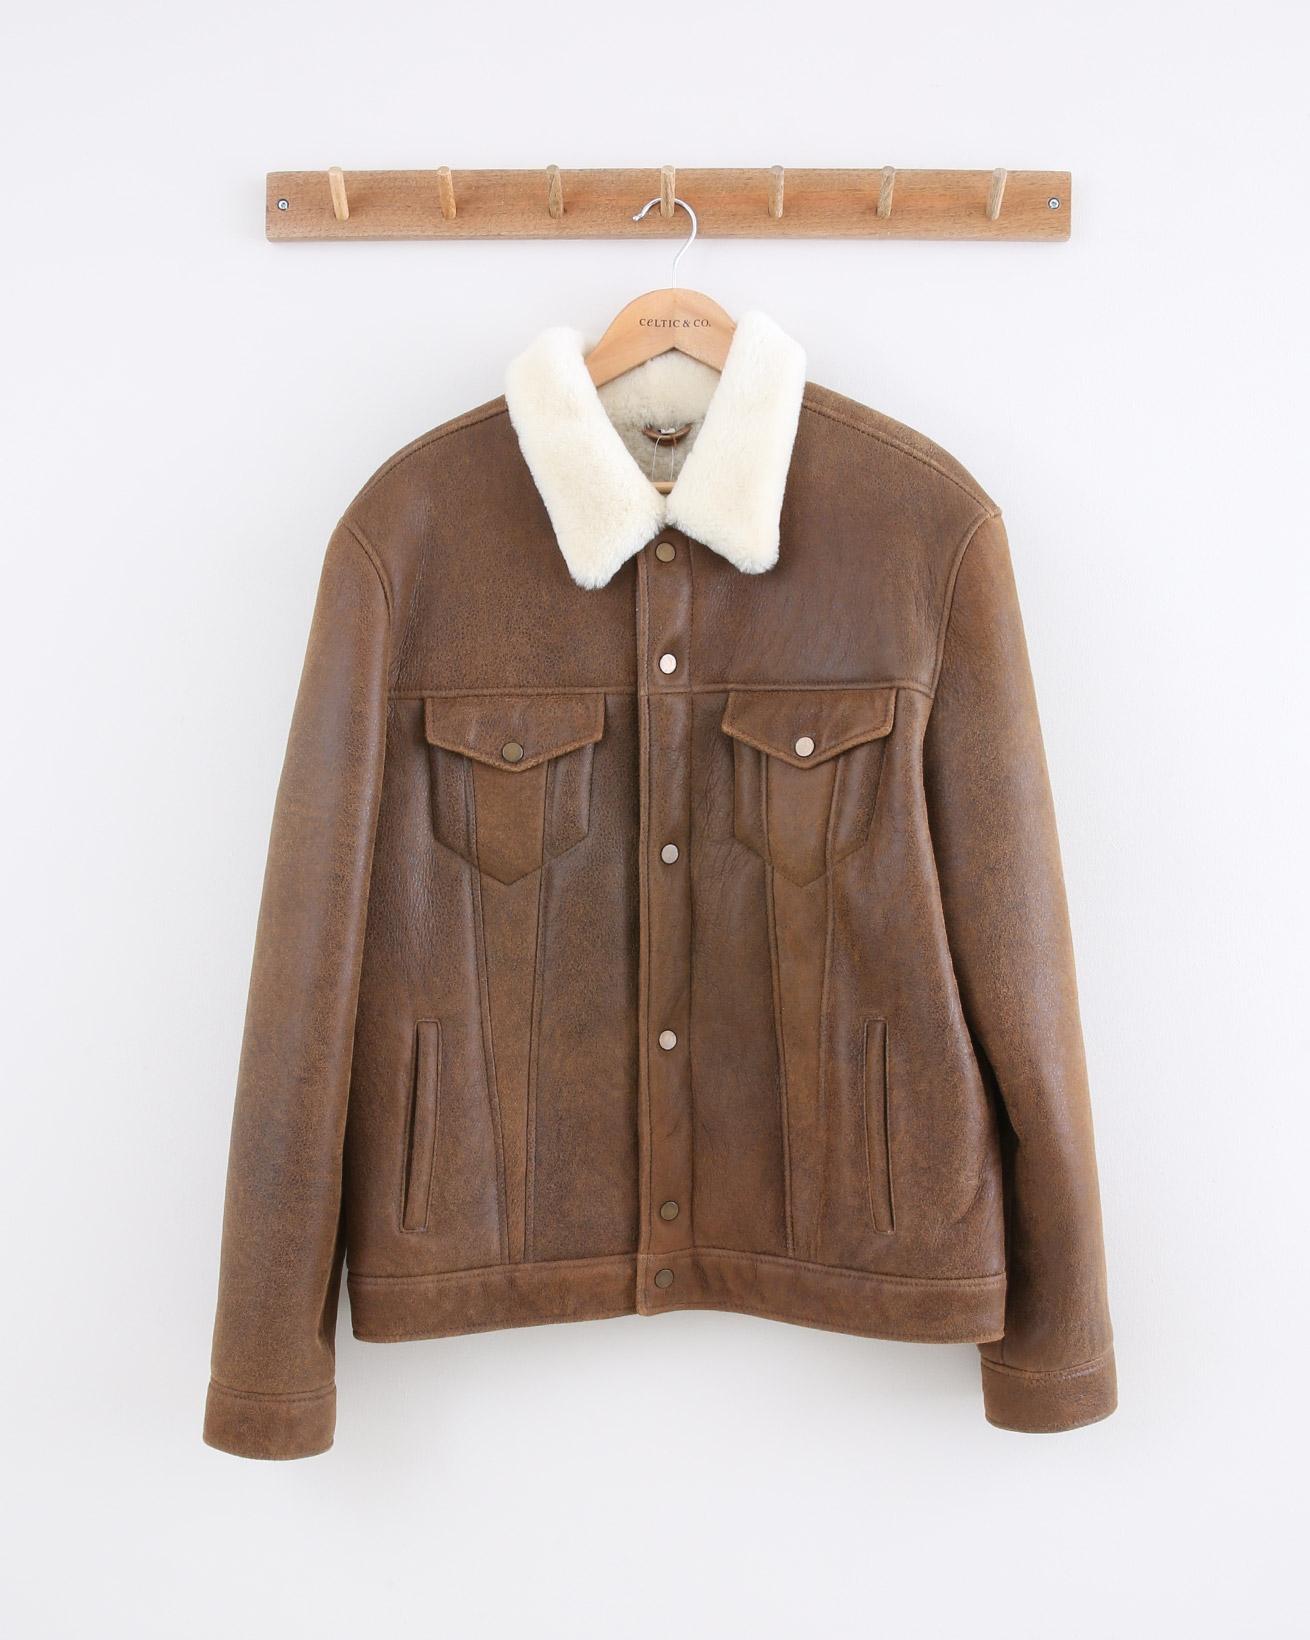 Mens Sheepskin Trucker Jacket - Size Medium - Whiskey & Cream - 1473